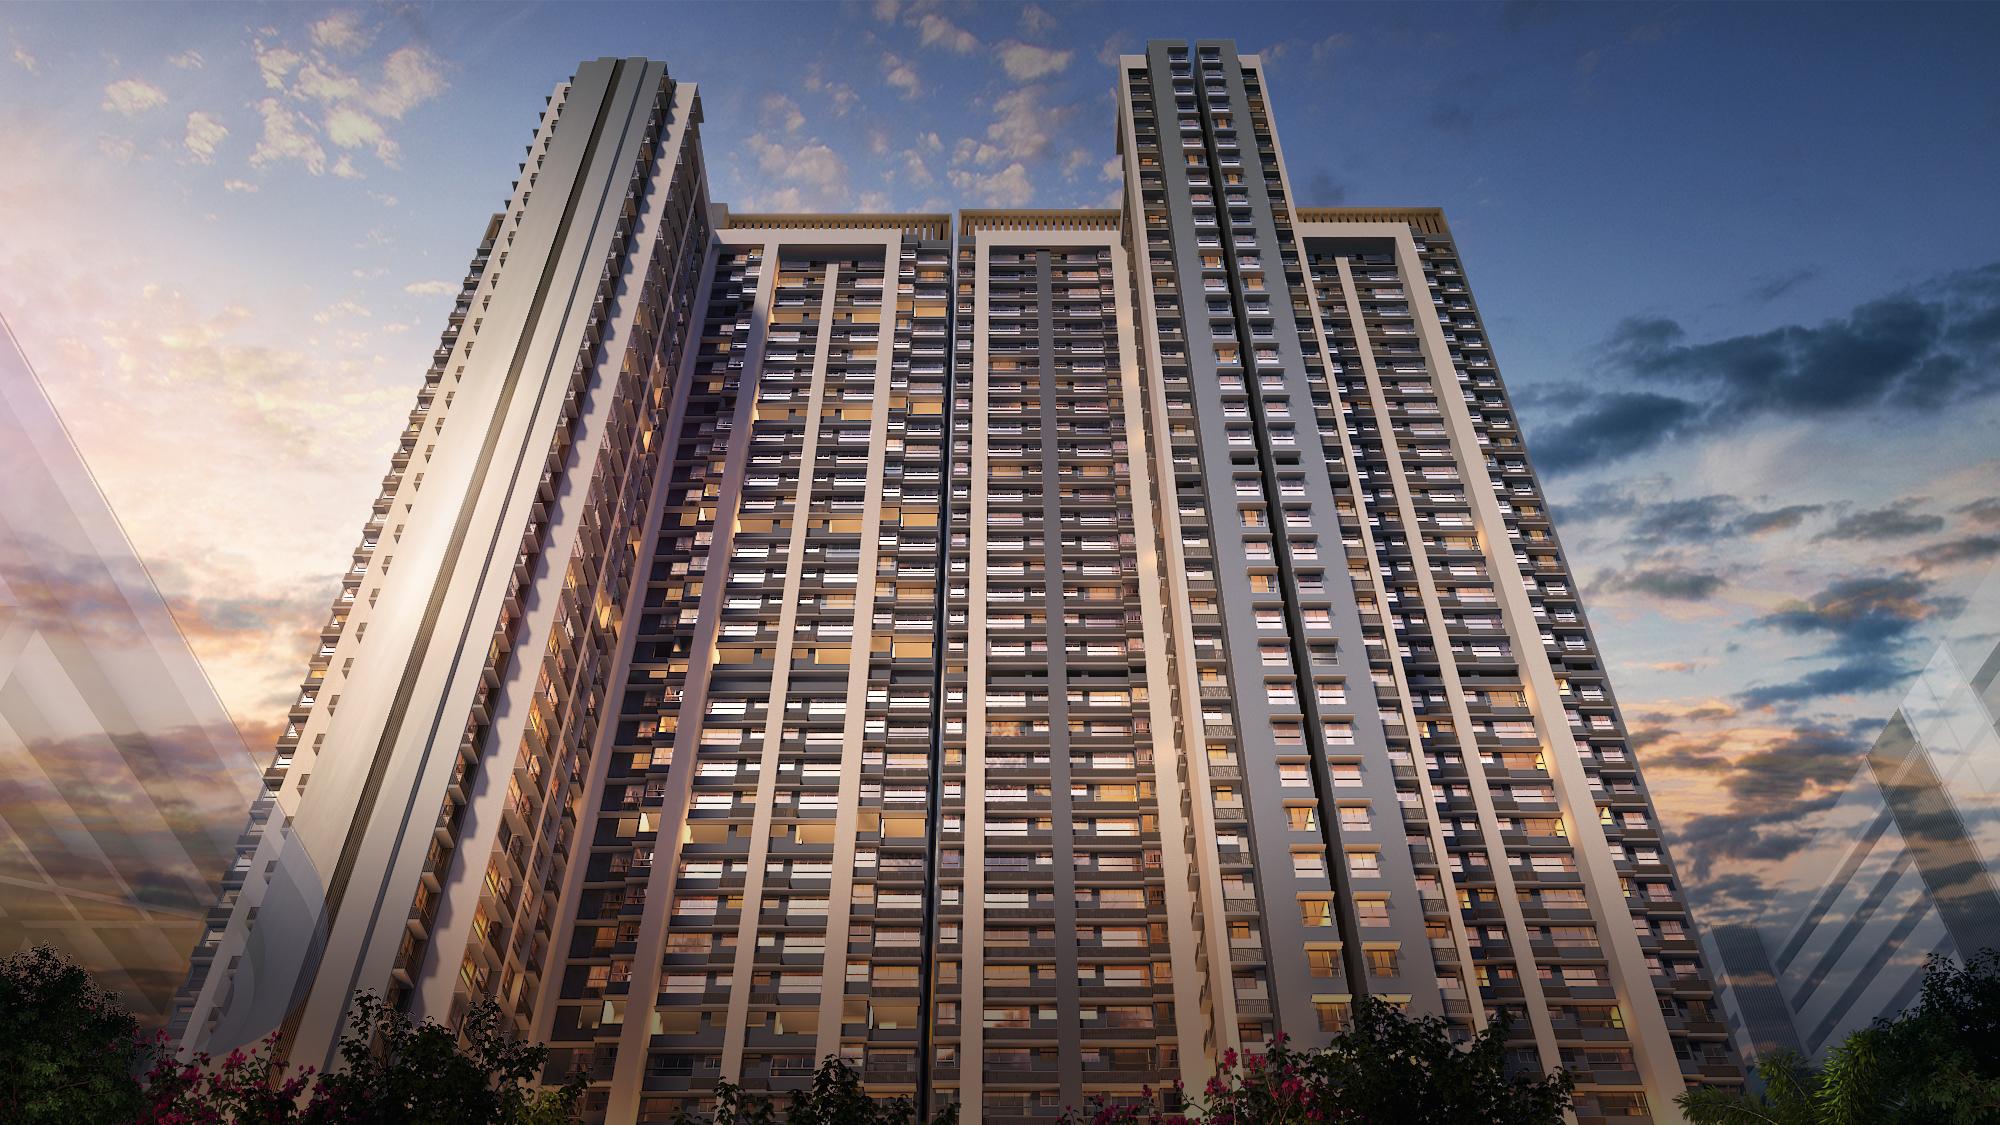 piramal vaikunth a class homes series 2 tower view17